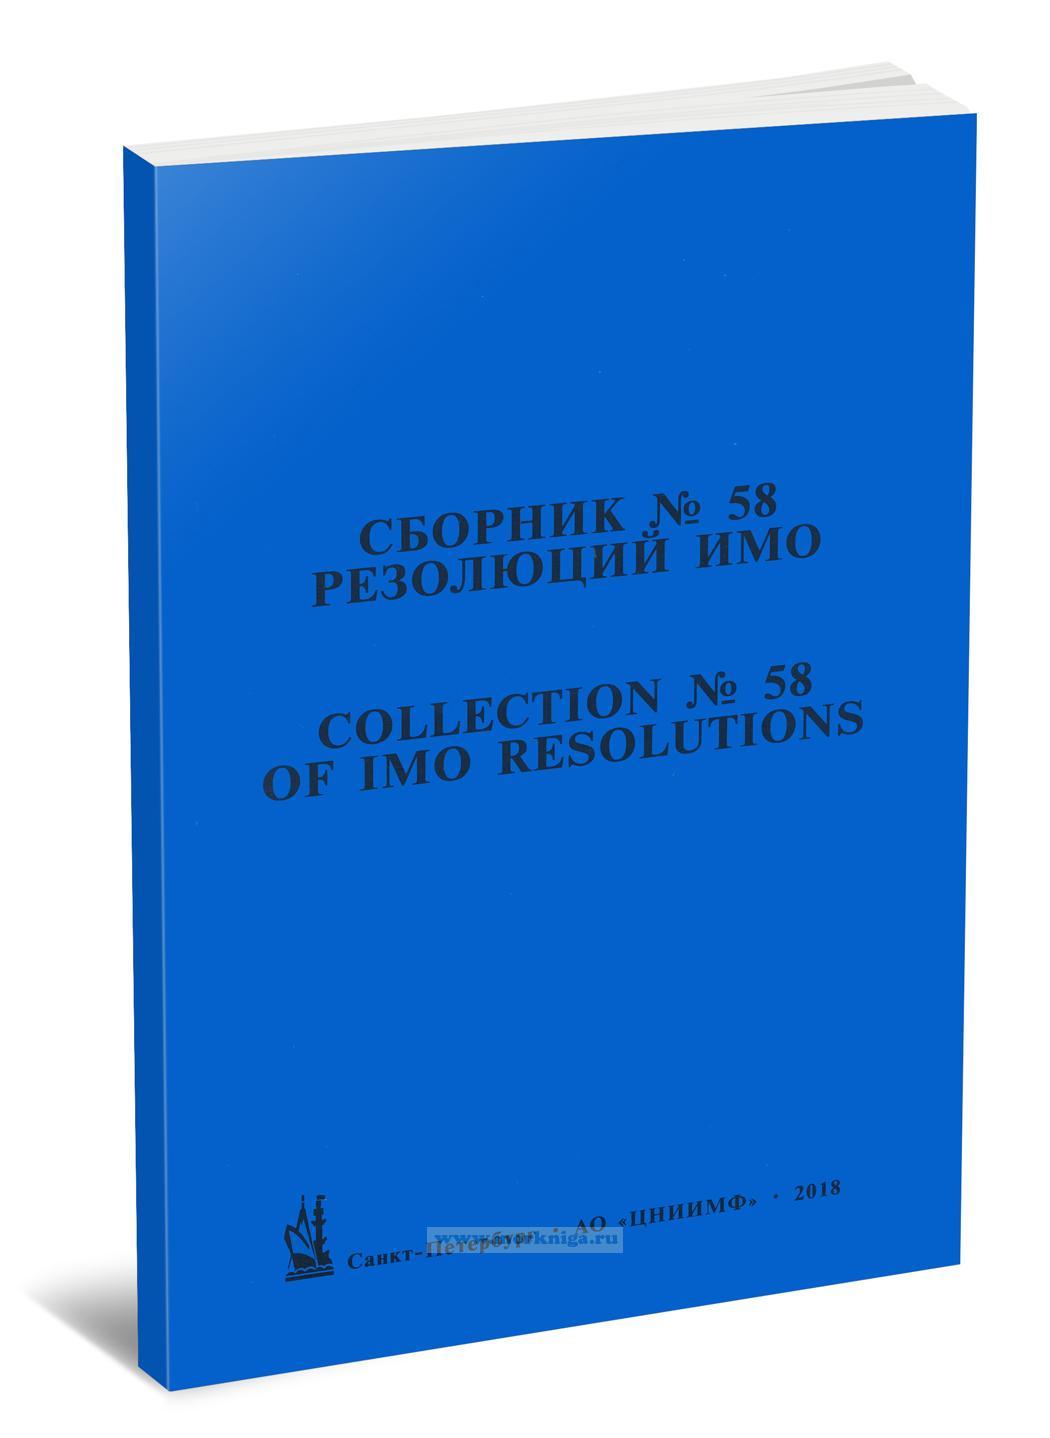 Сборник № 58 резолюций ИМО/ Collection No.58 of IMO Resolutions